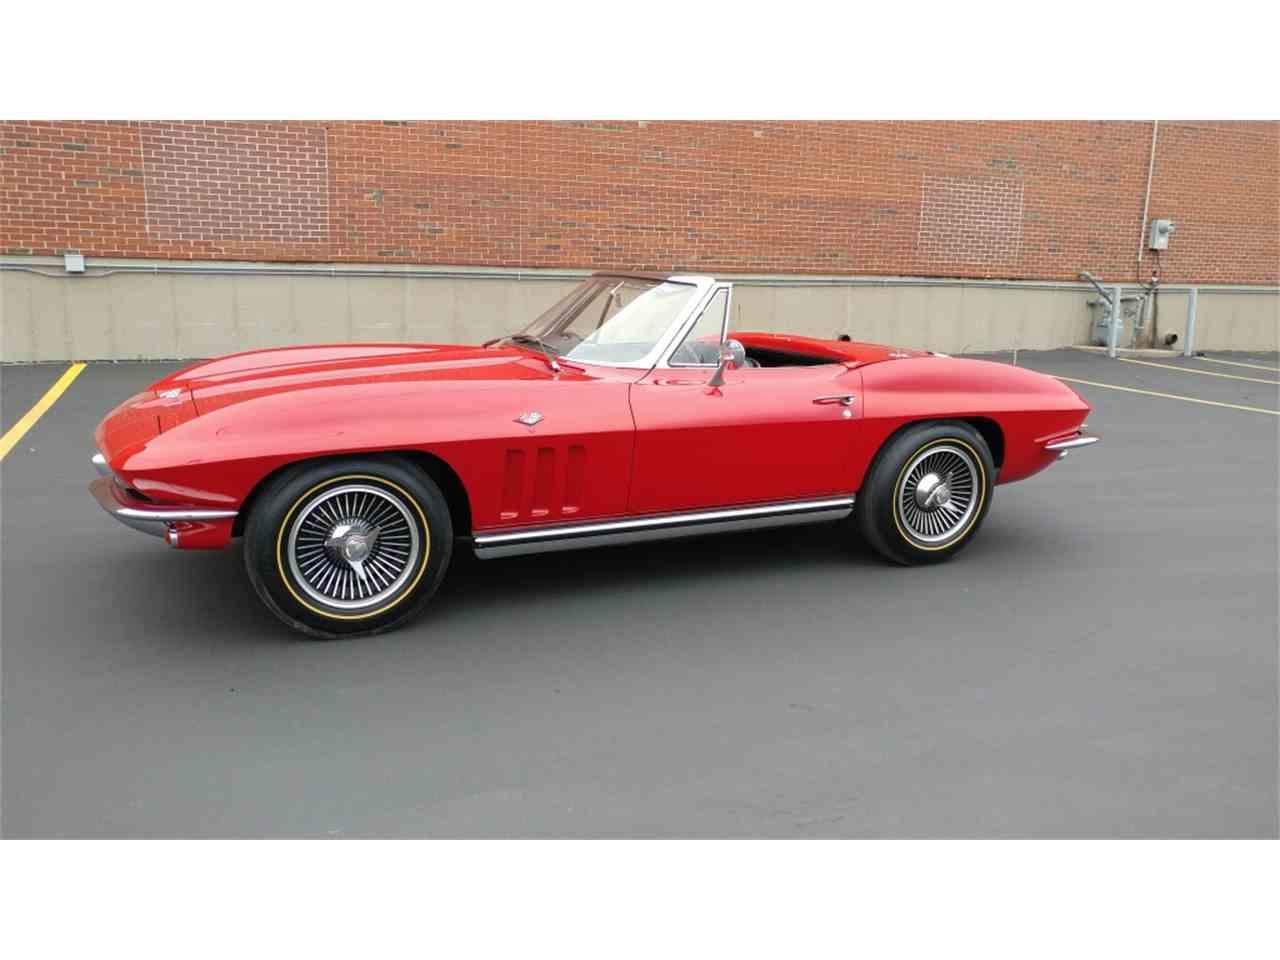 Large Picture of Classic '65 Chevrolet Corvette located in Missouri - $69,995.00 - MO2I